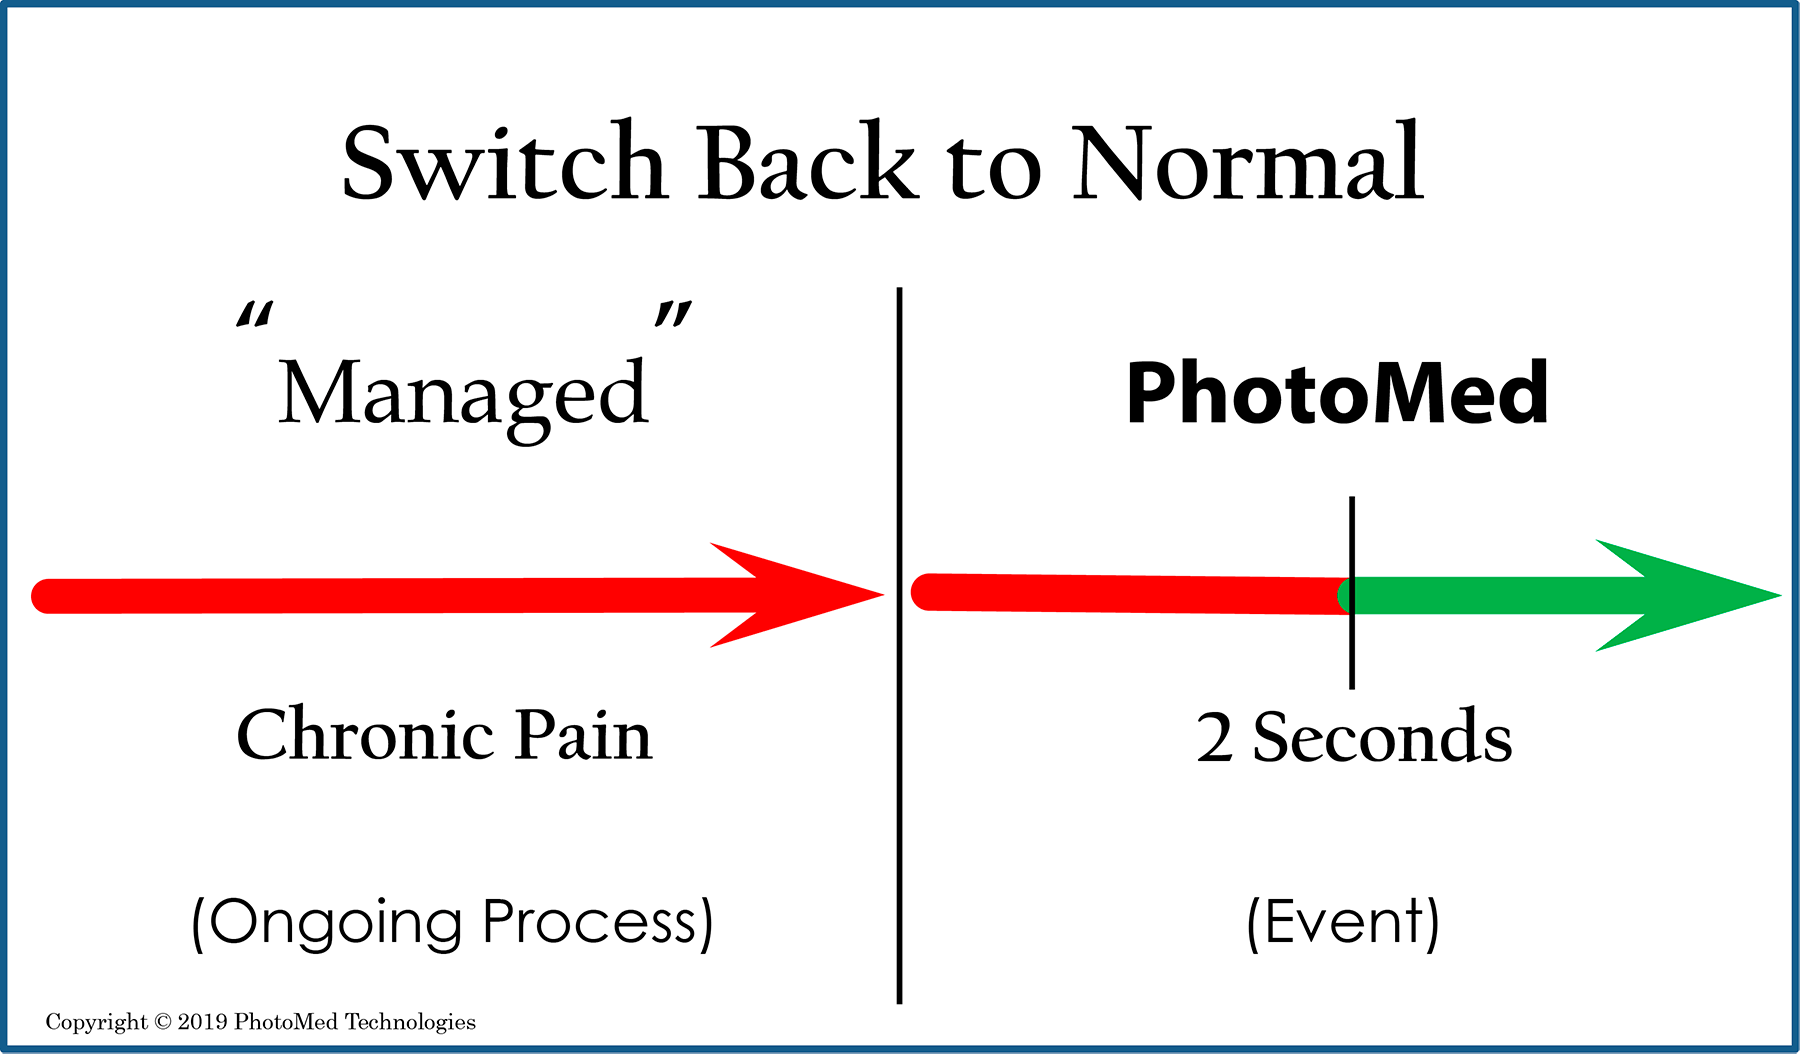 Return-ProcessOrEvent.png